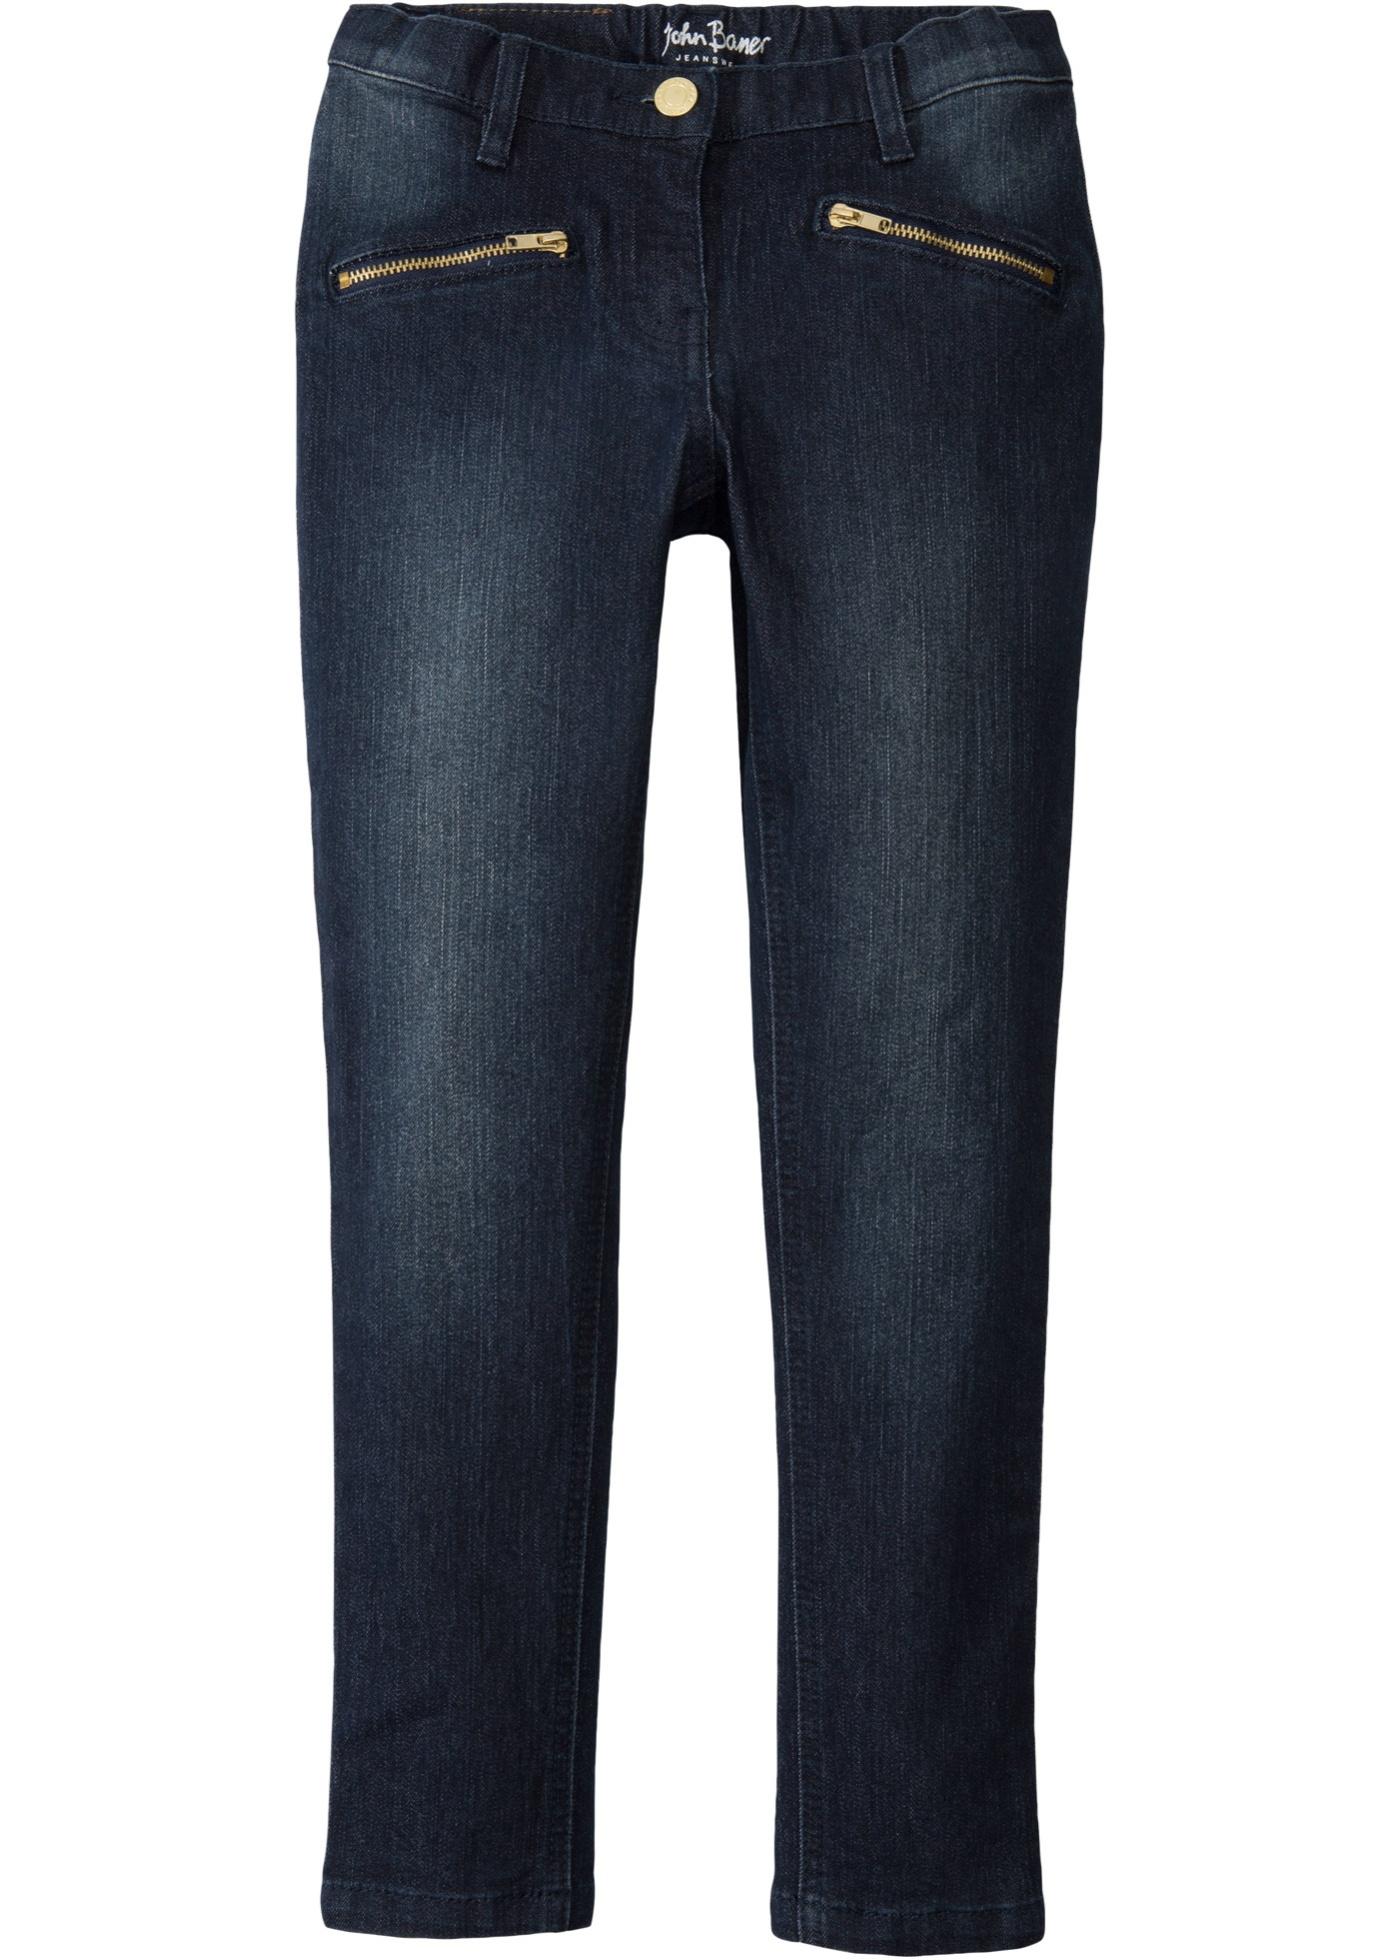 Jean skinny avec poches décoratives